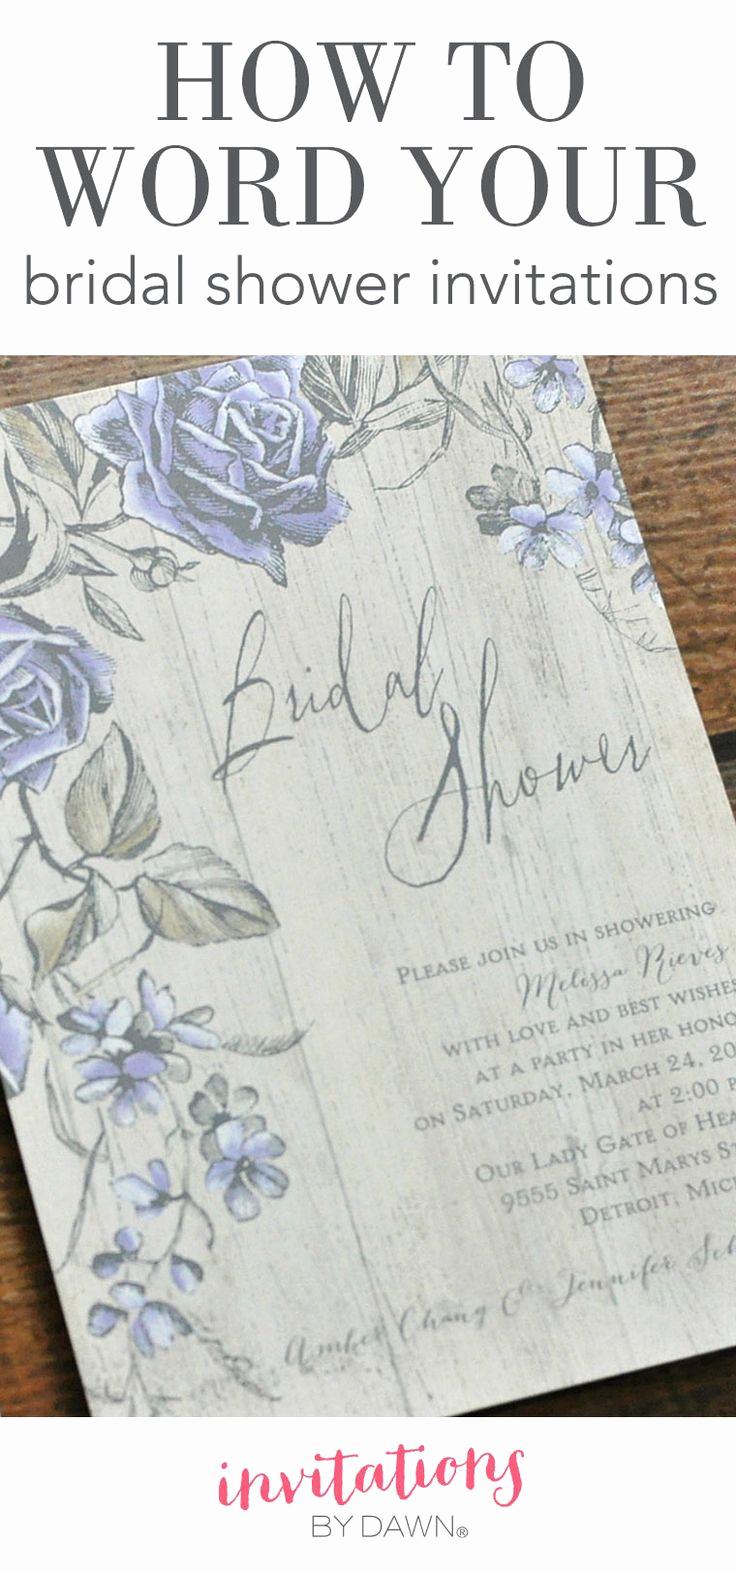 Recipe Shower Invitation Wording Beautiful Best 25 Bridal Shower Invitation Wording Ideas On